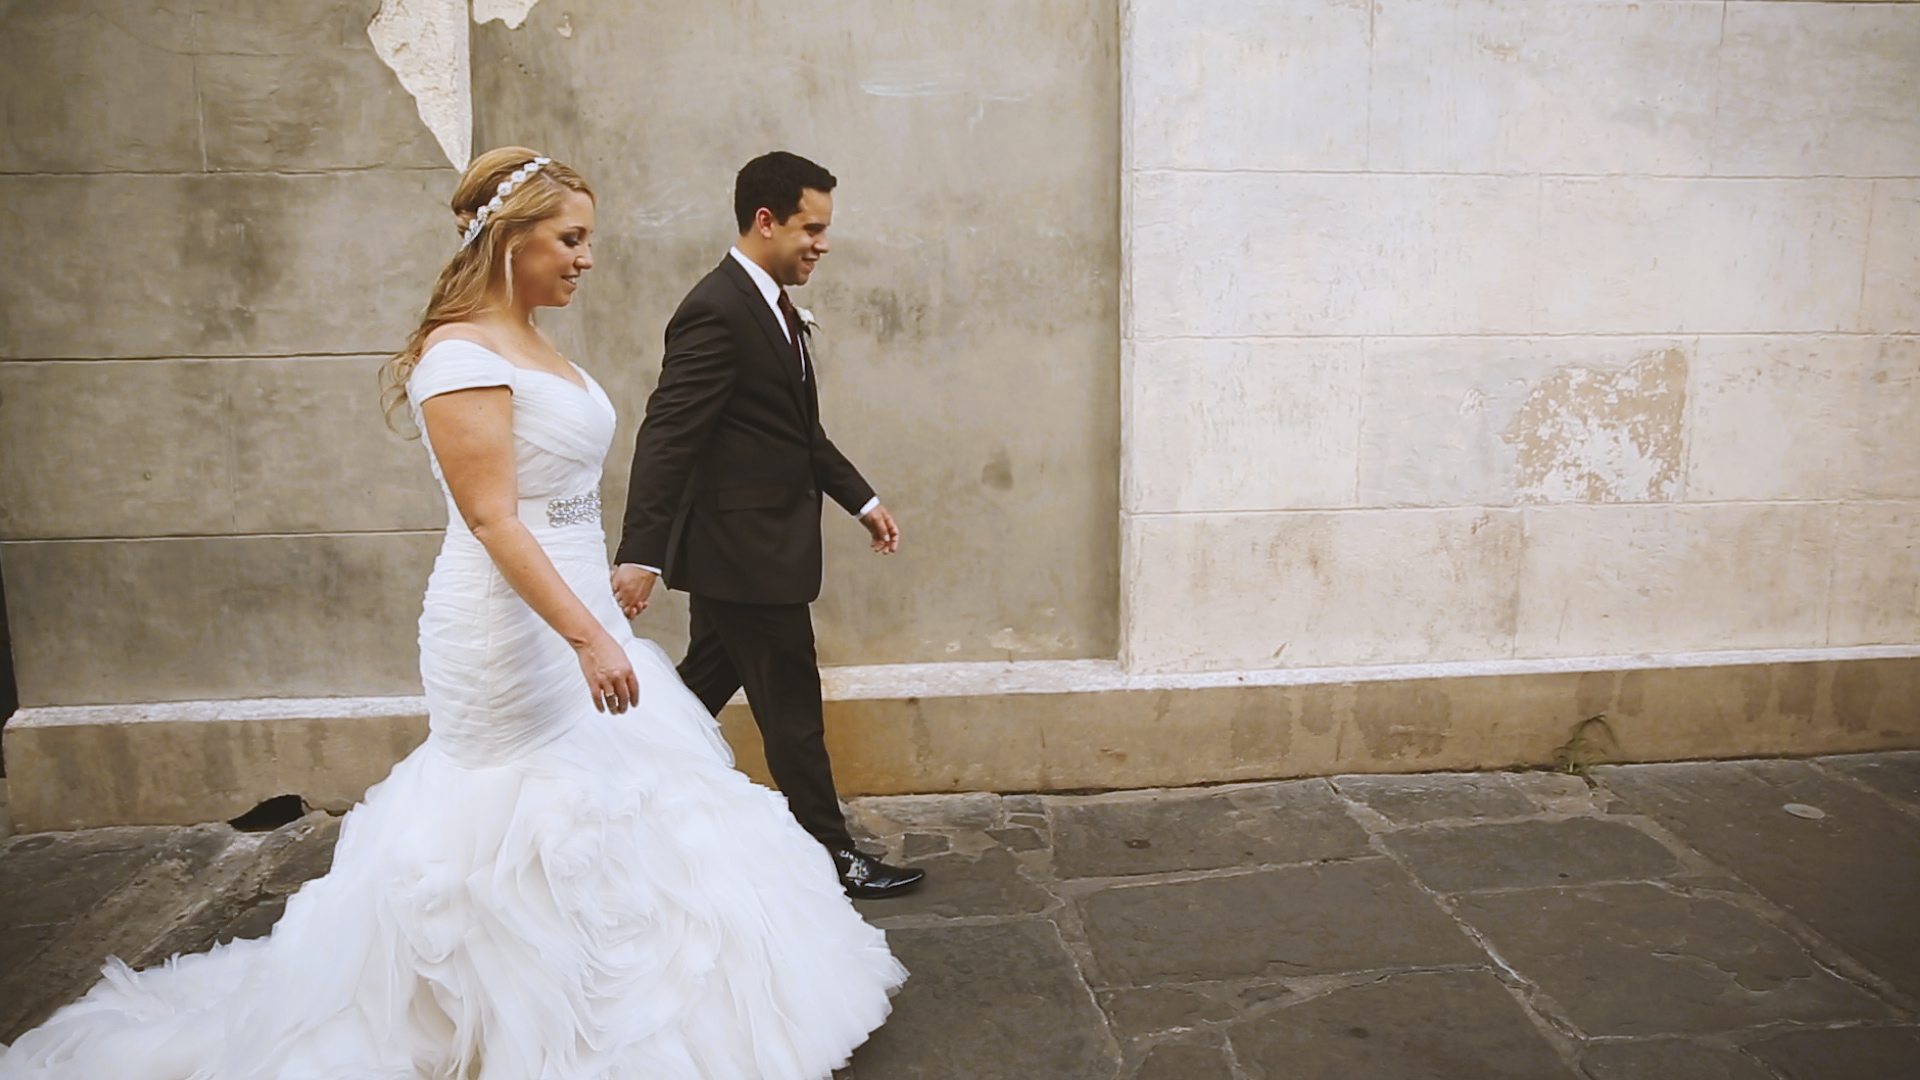 Wedding Day Portraits - Bride Film